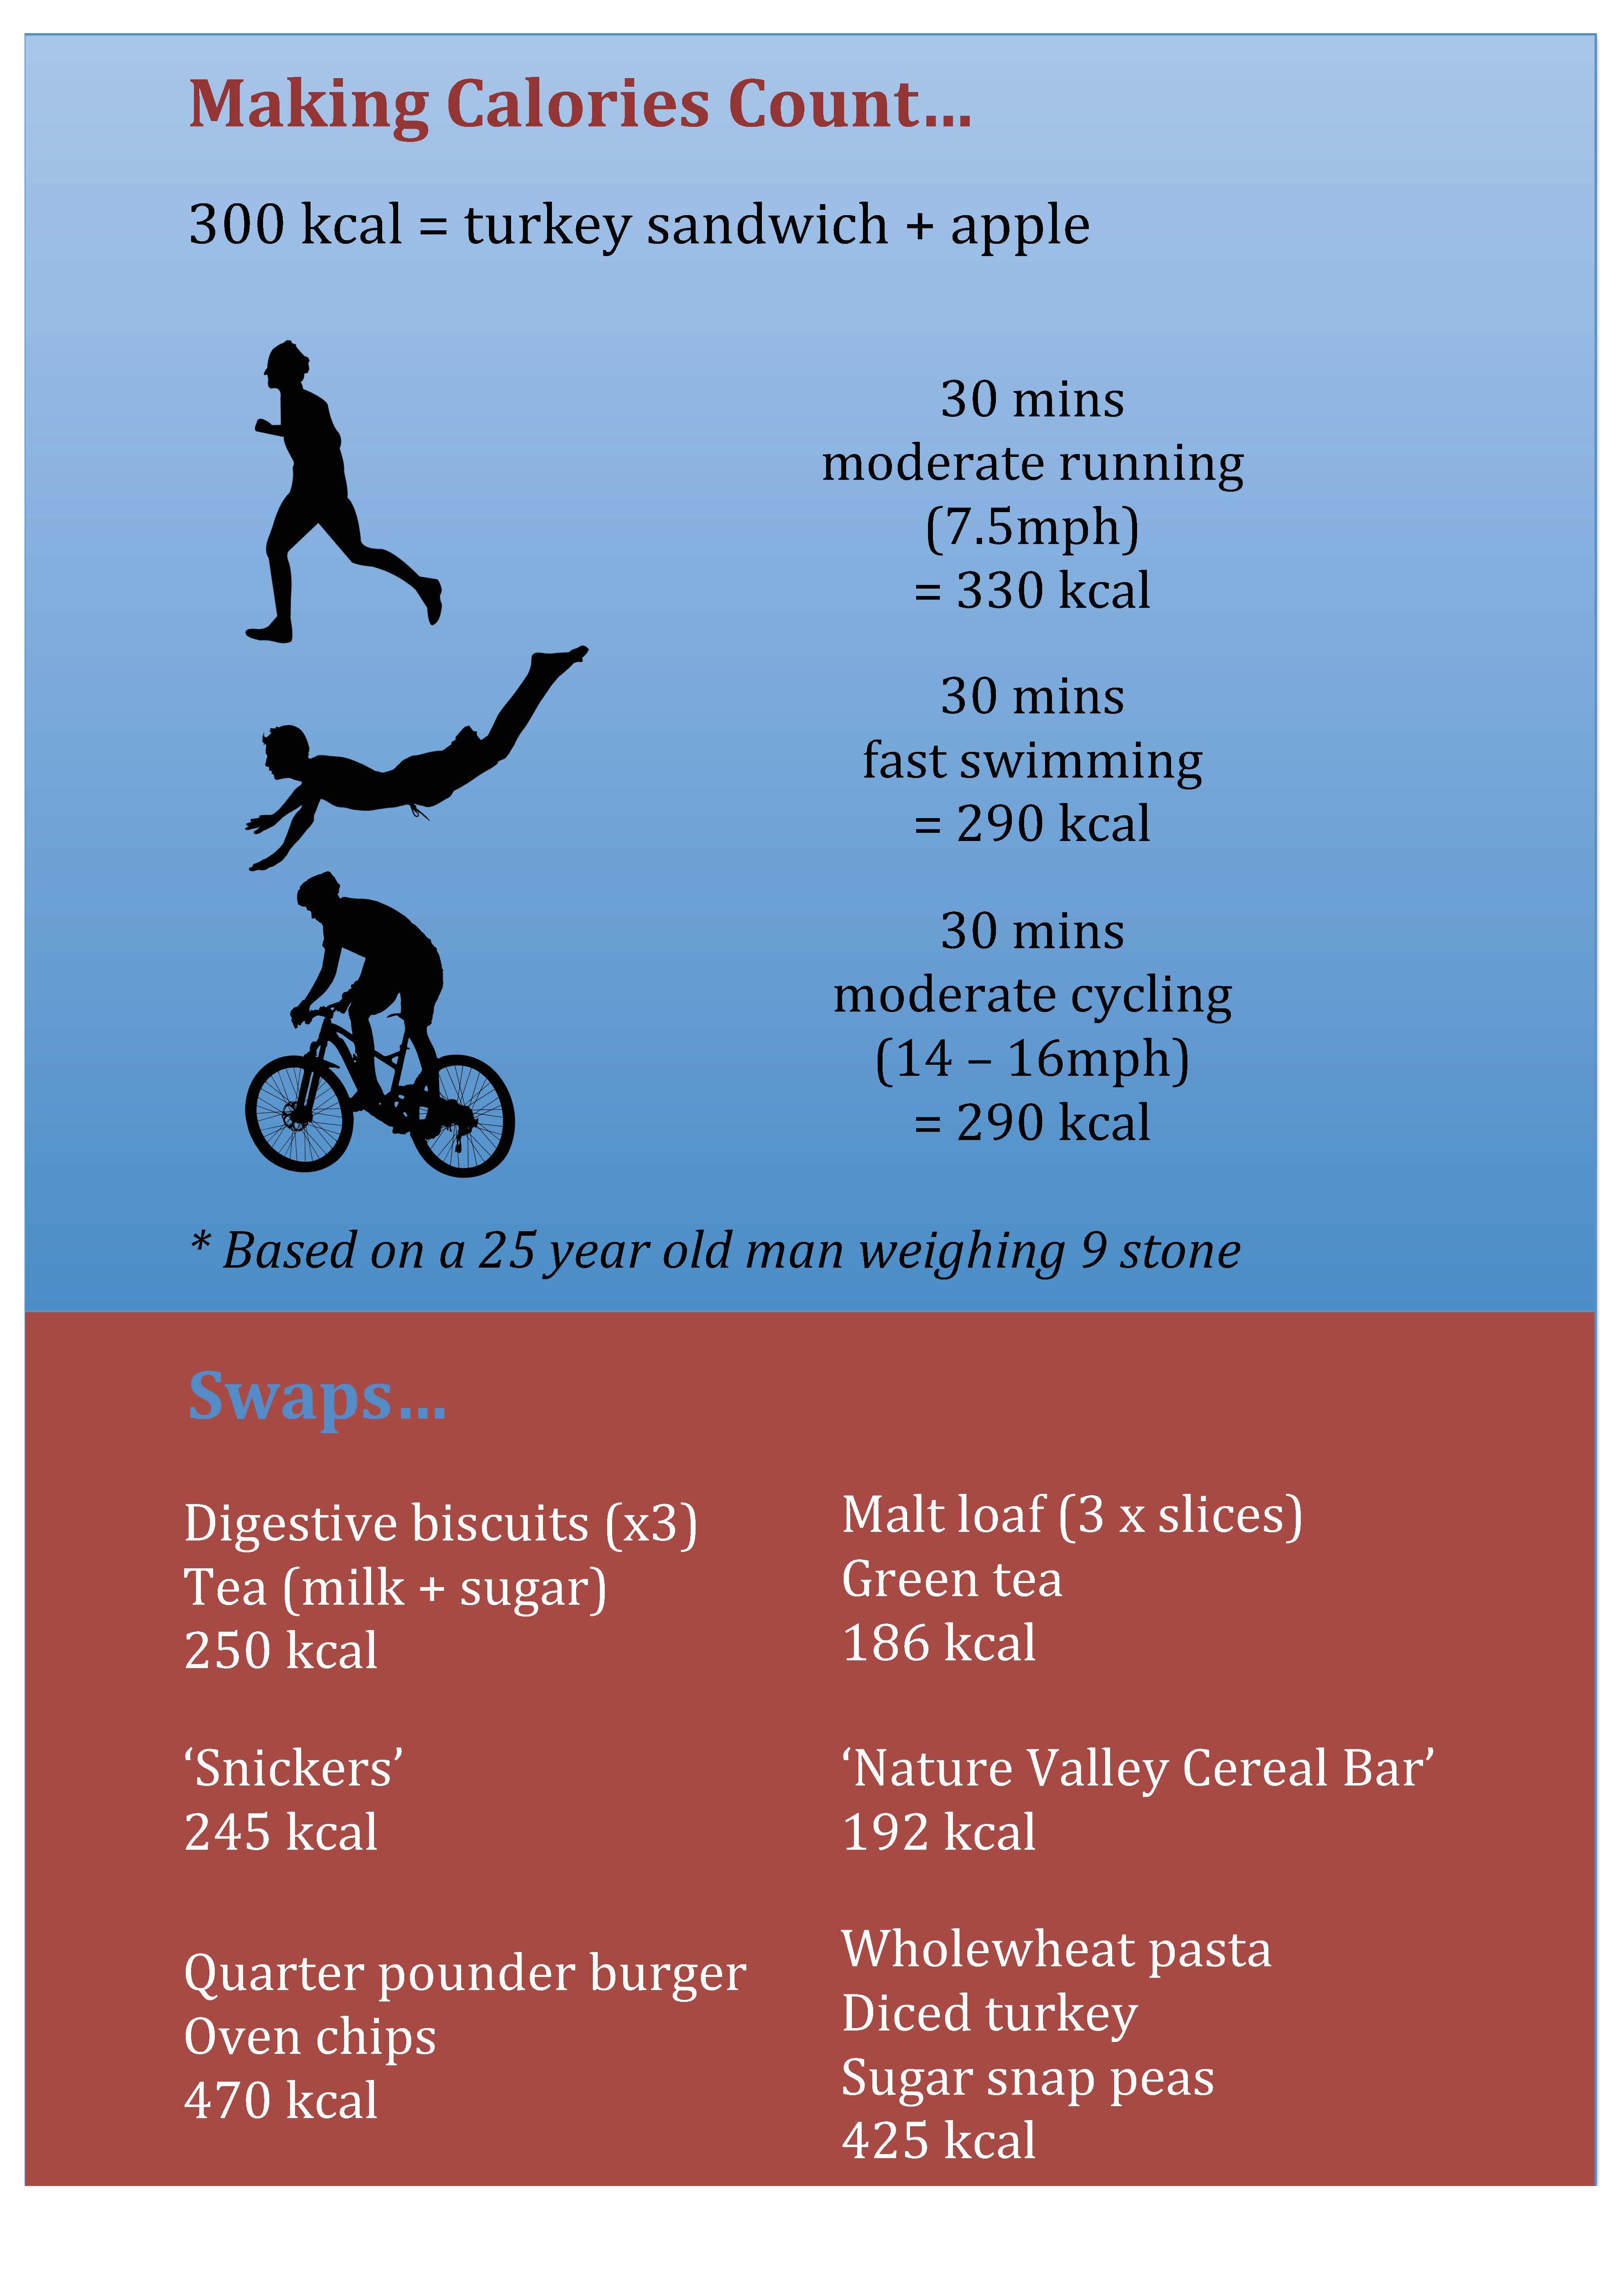 Making calories count for jockeys